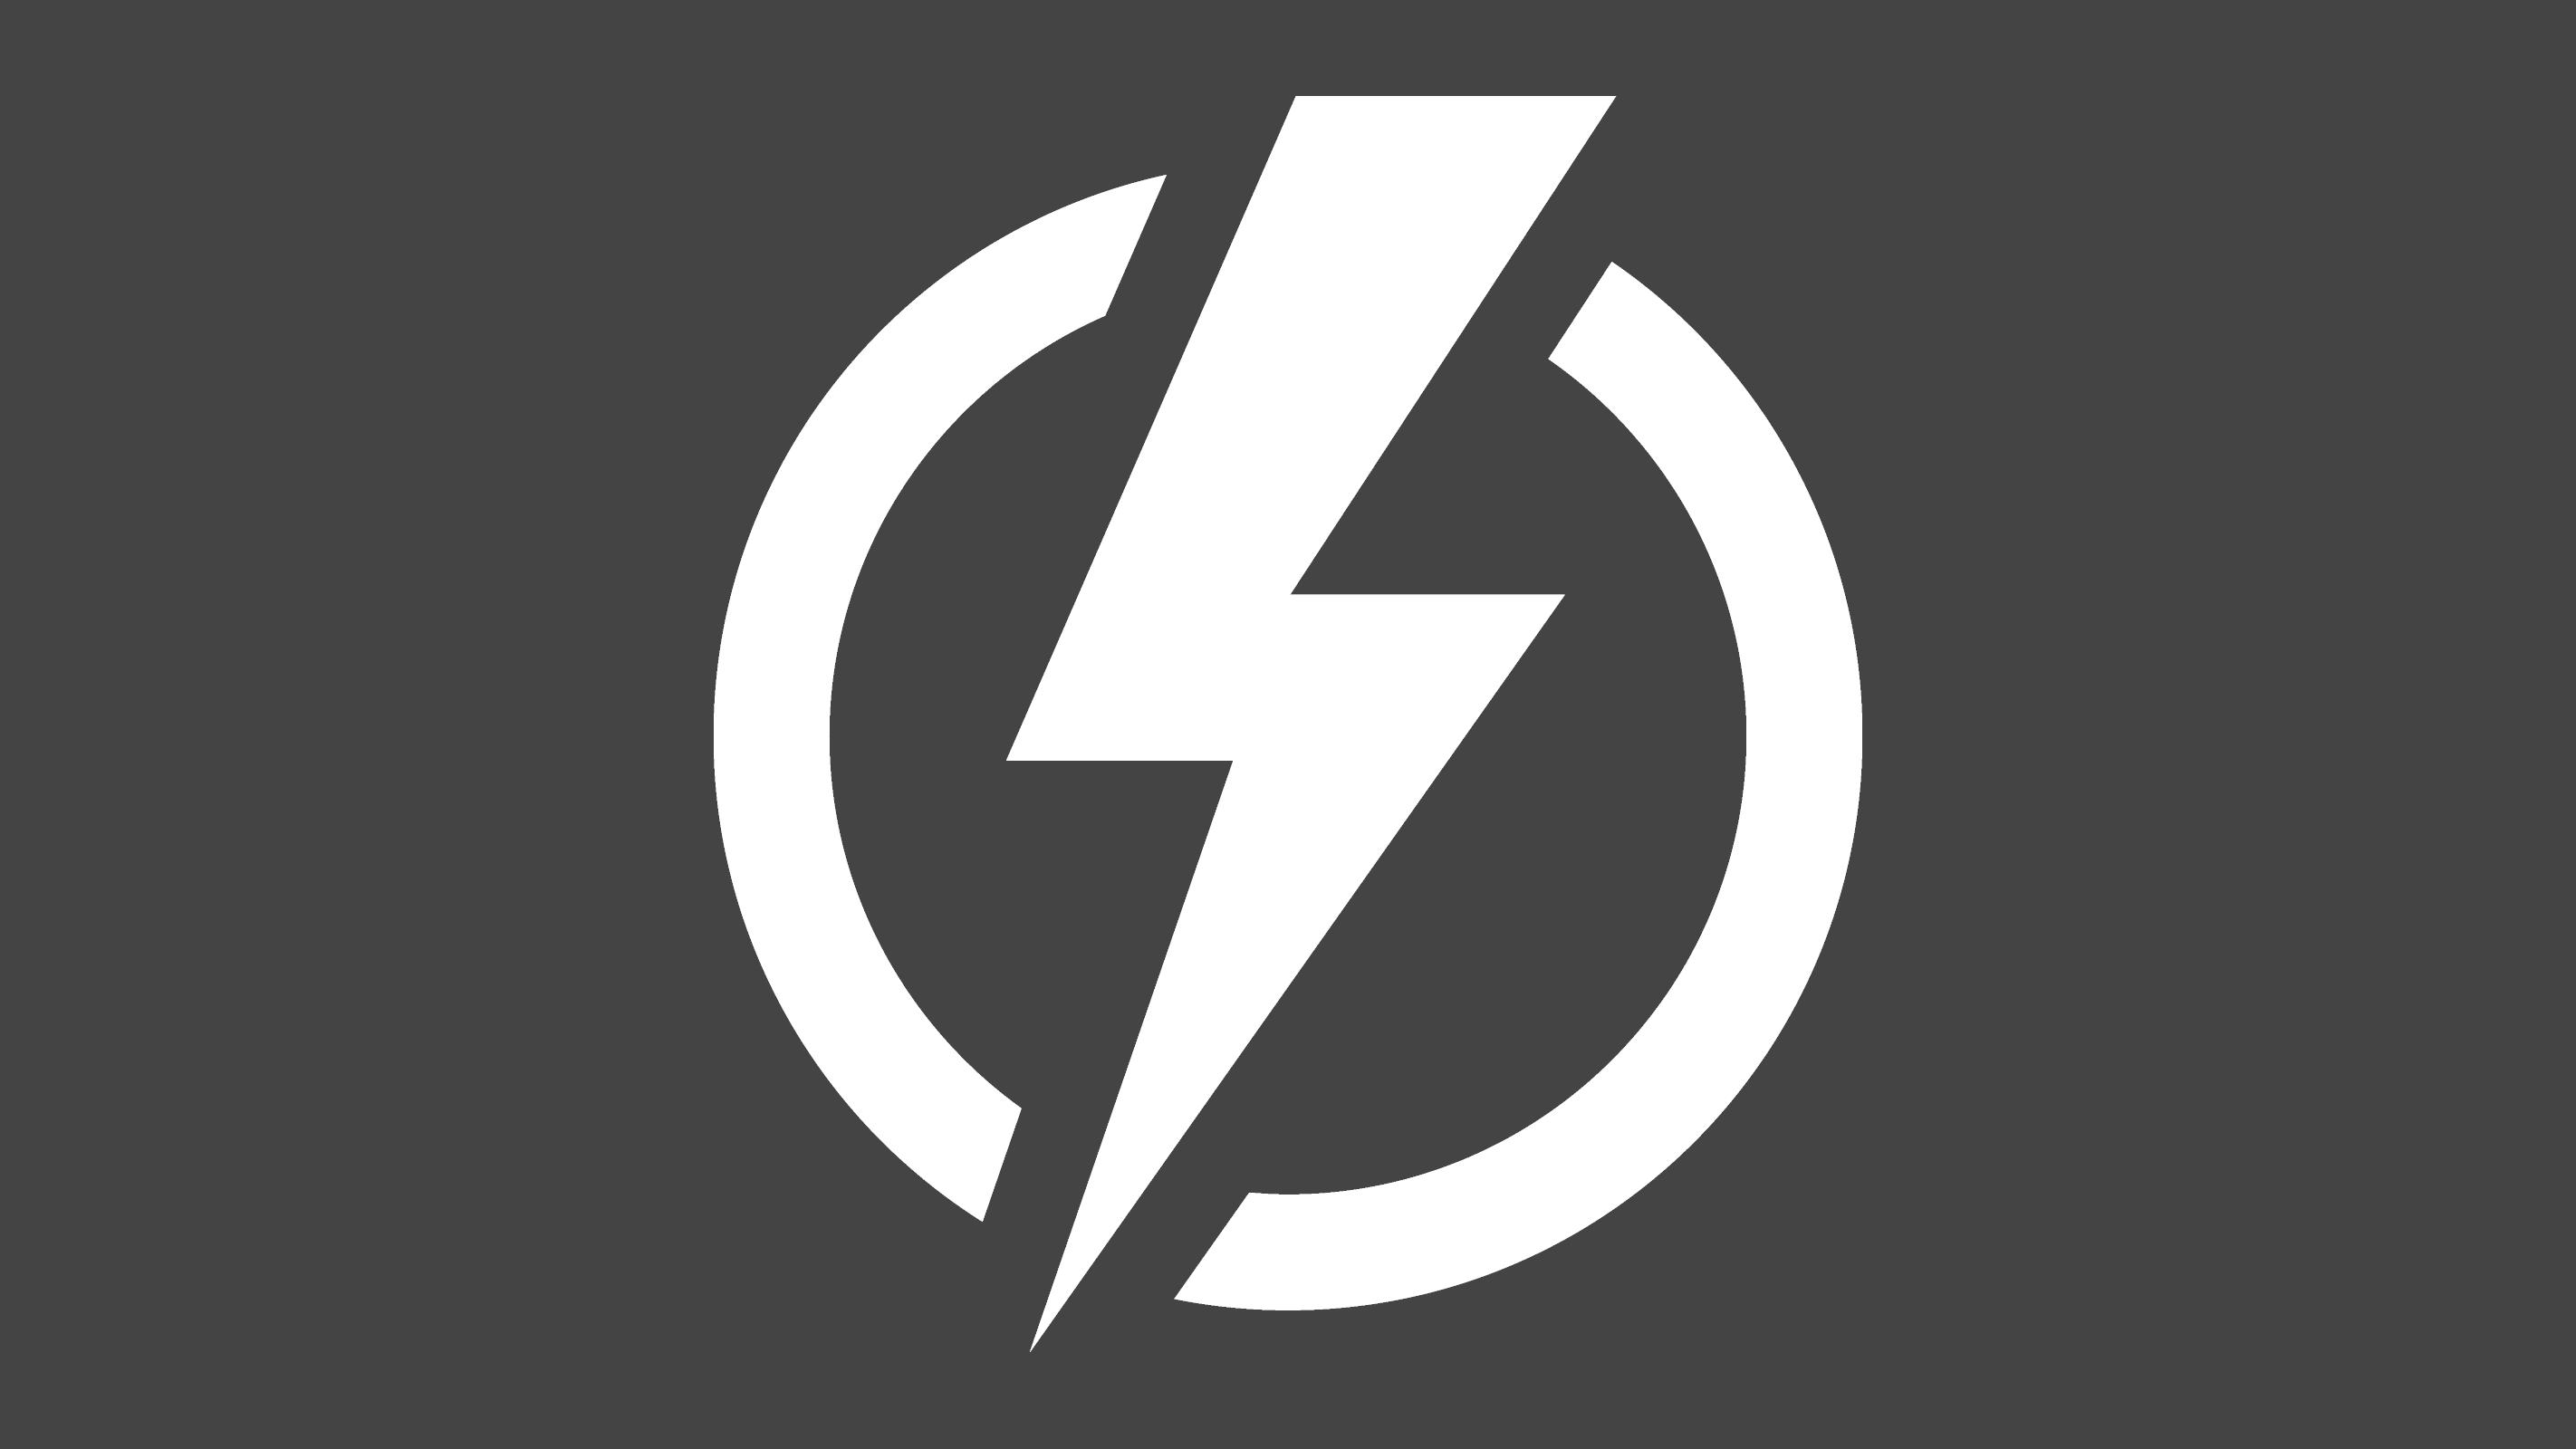 Amps to Volt-Amps (VA) Electrical Conversion Calculator